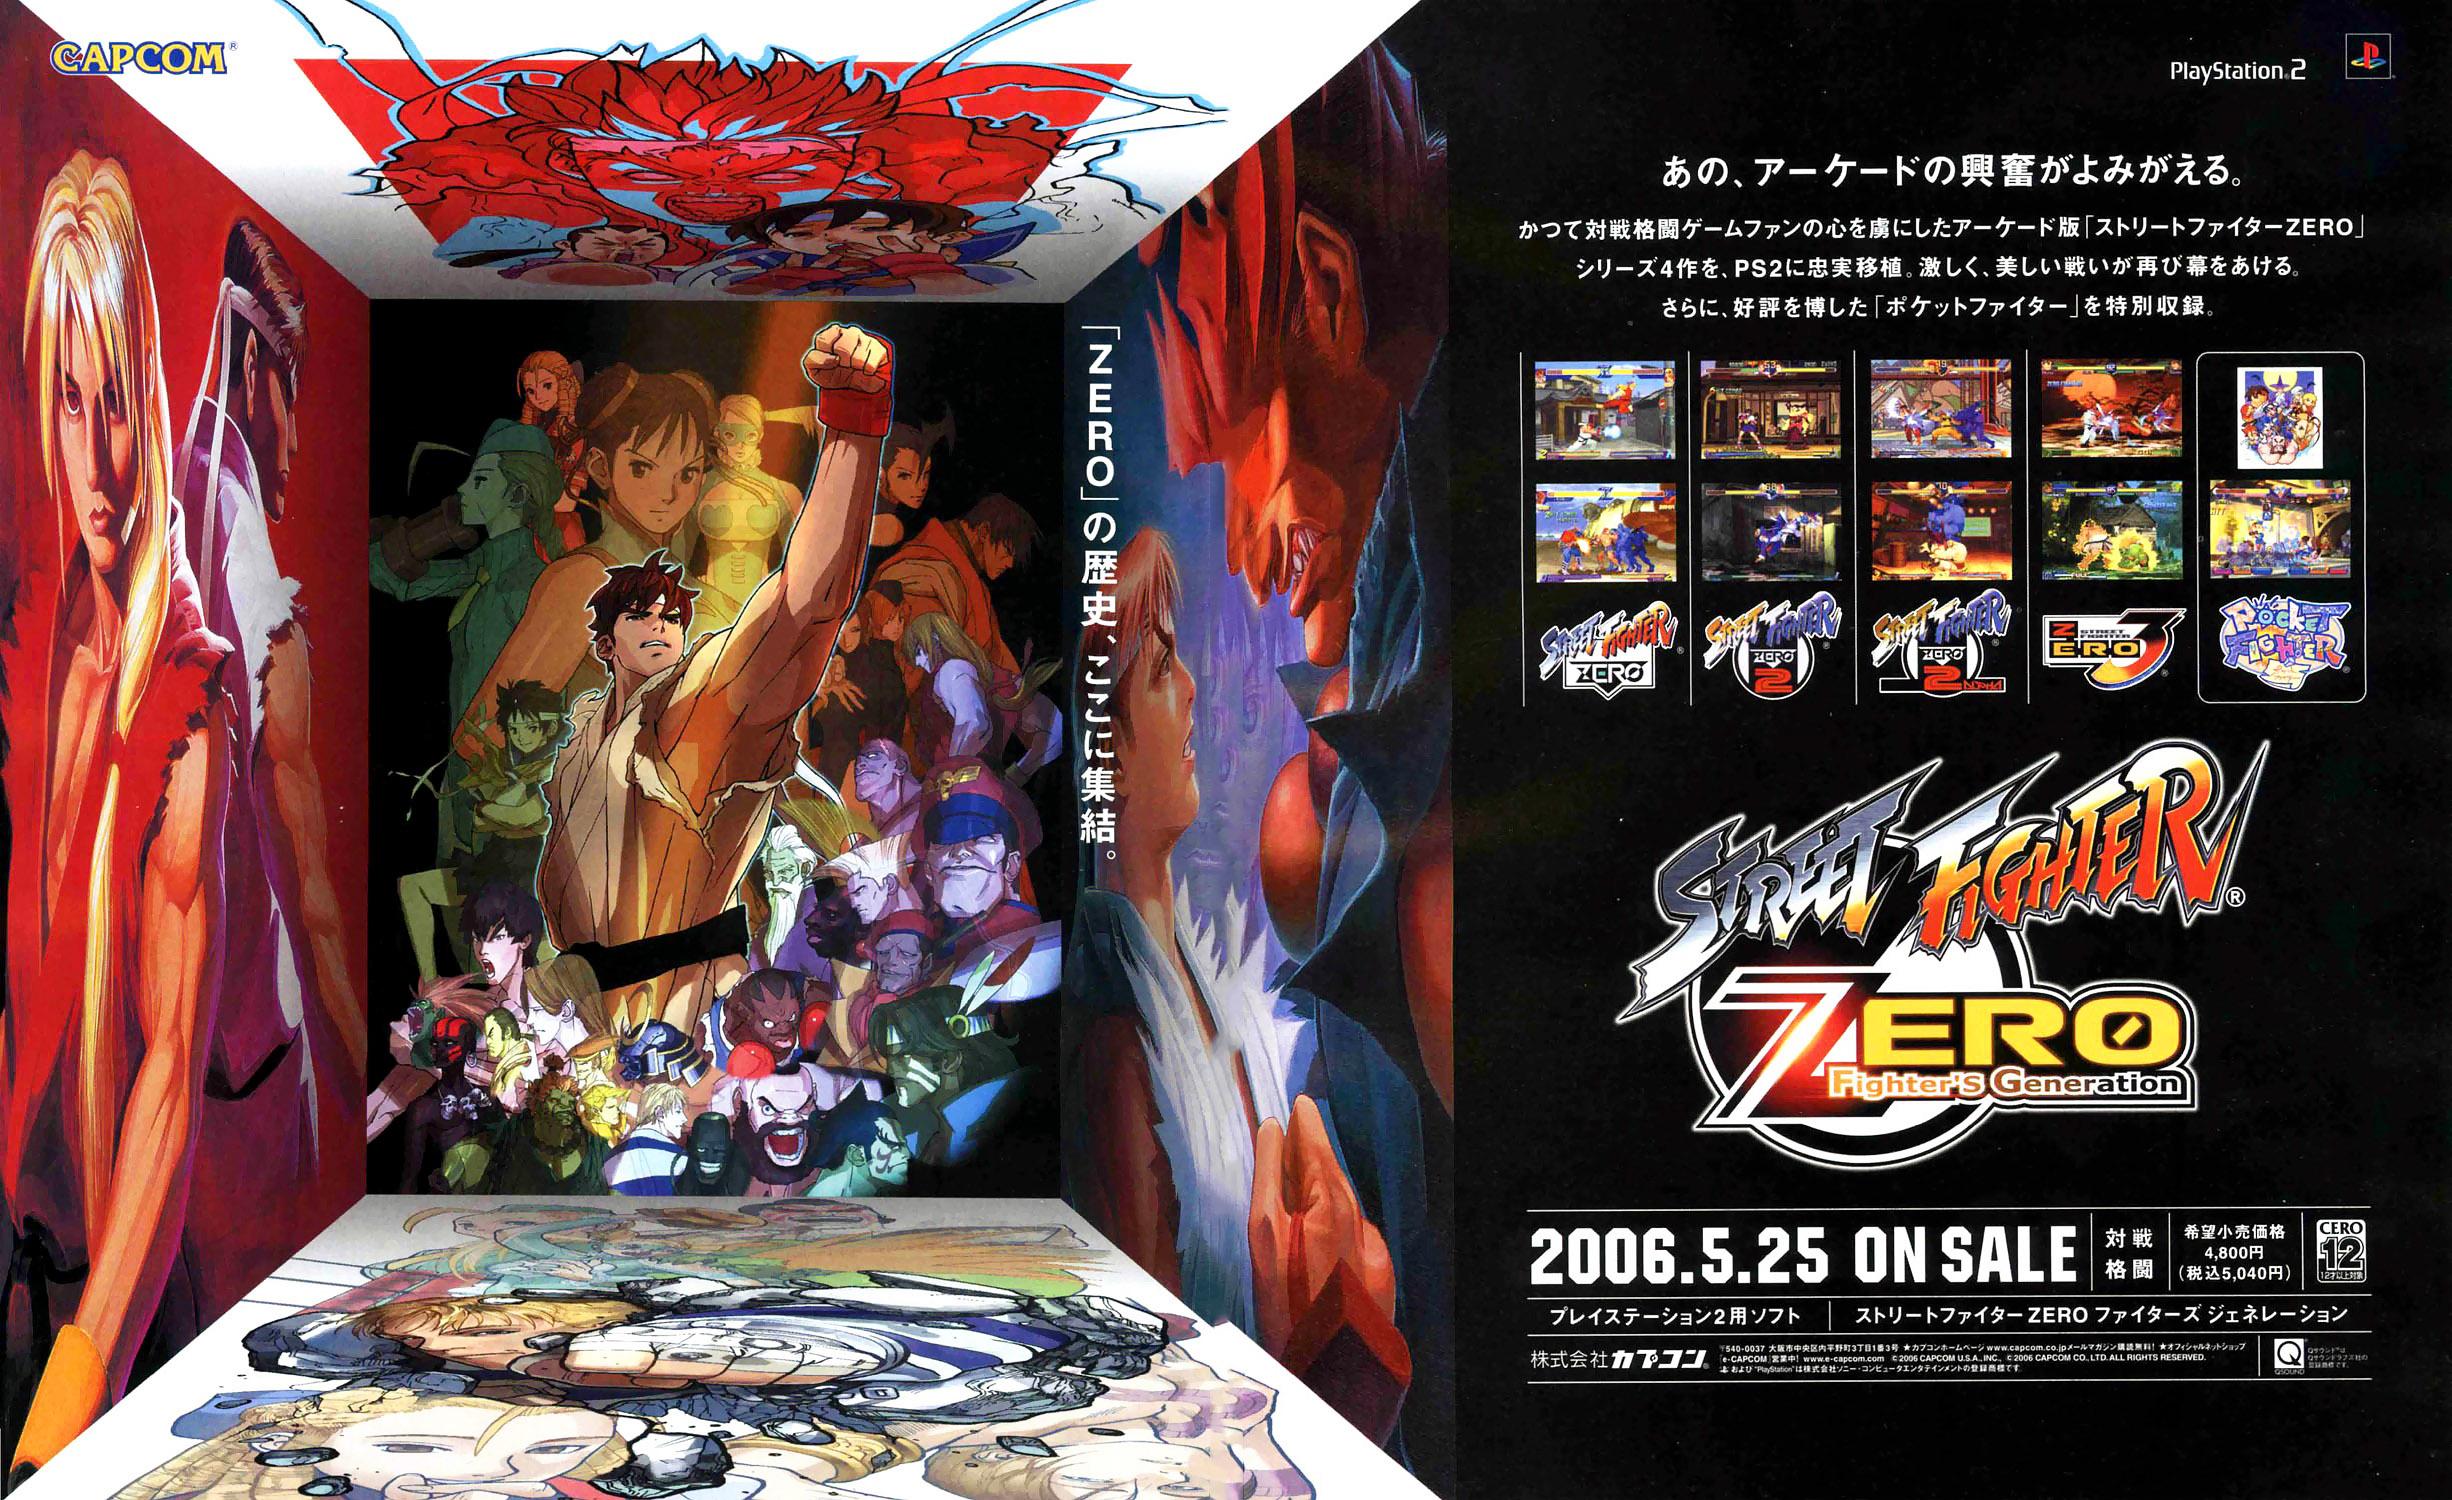 Street Fighter Zero Fighter S Generation Japan Playstation 2